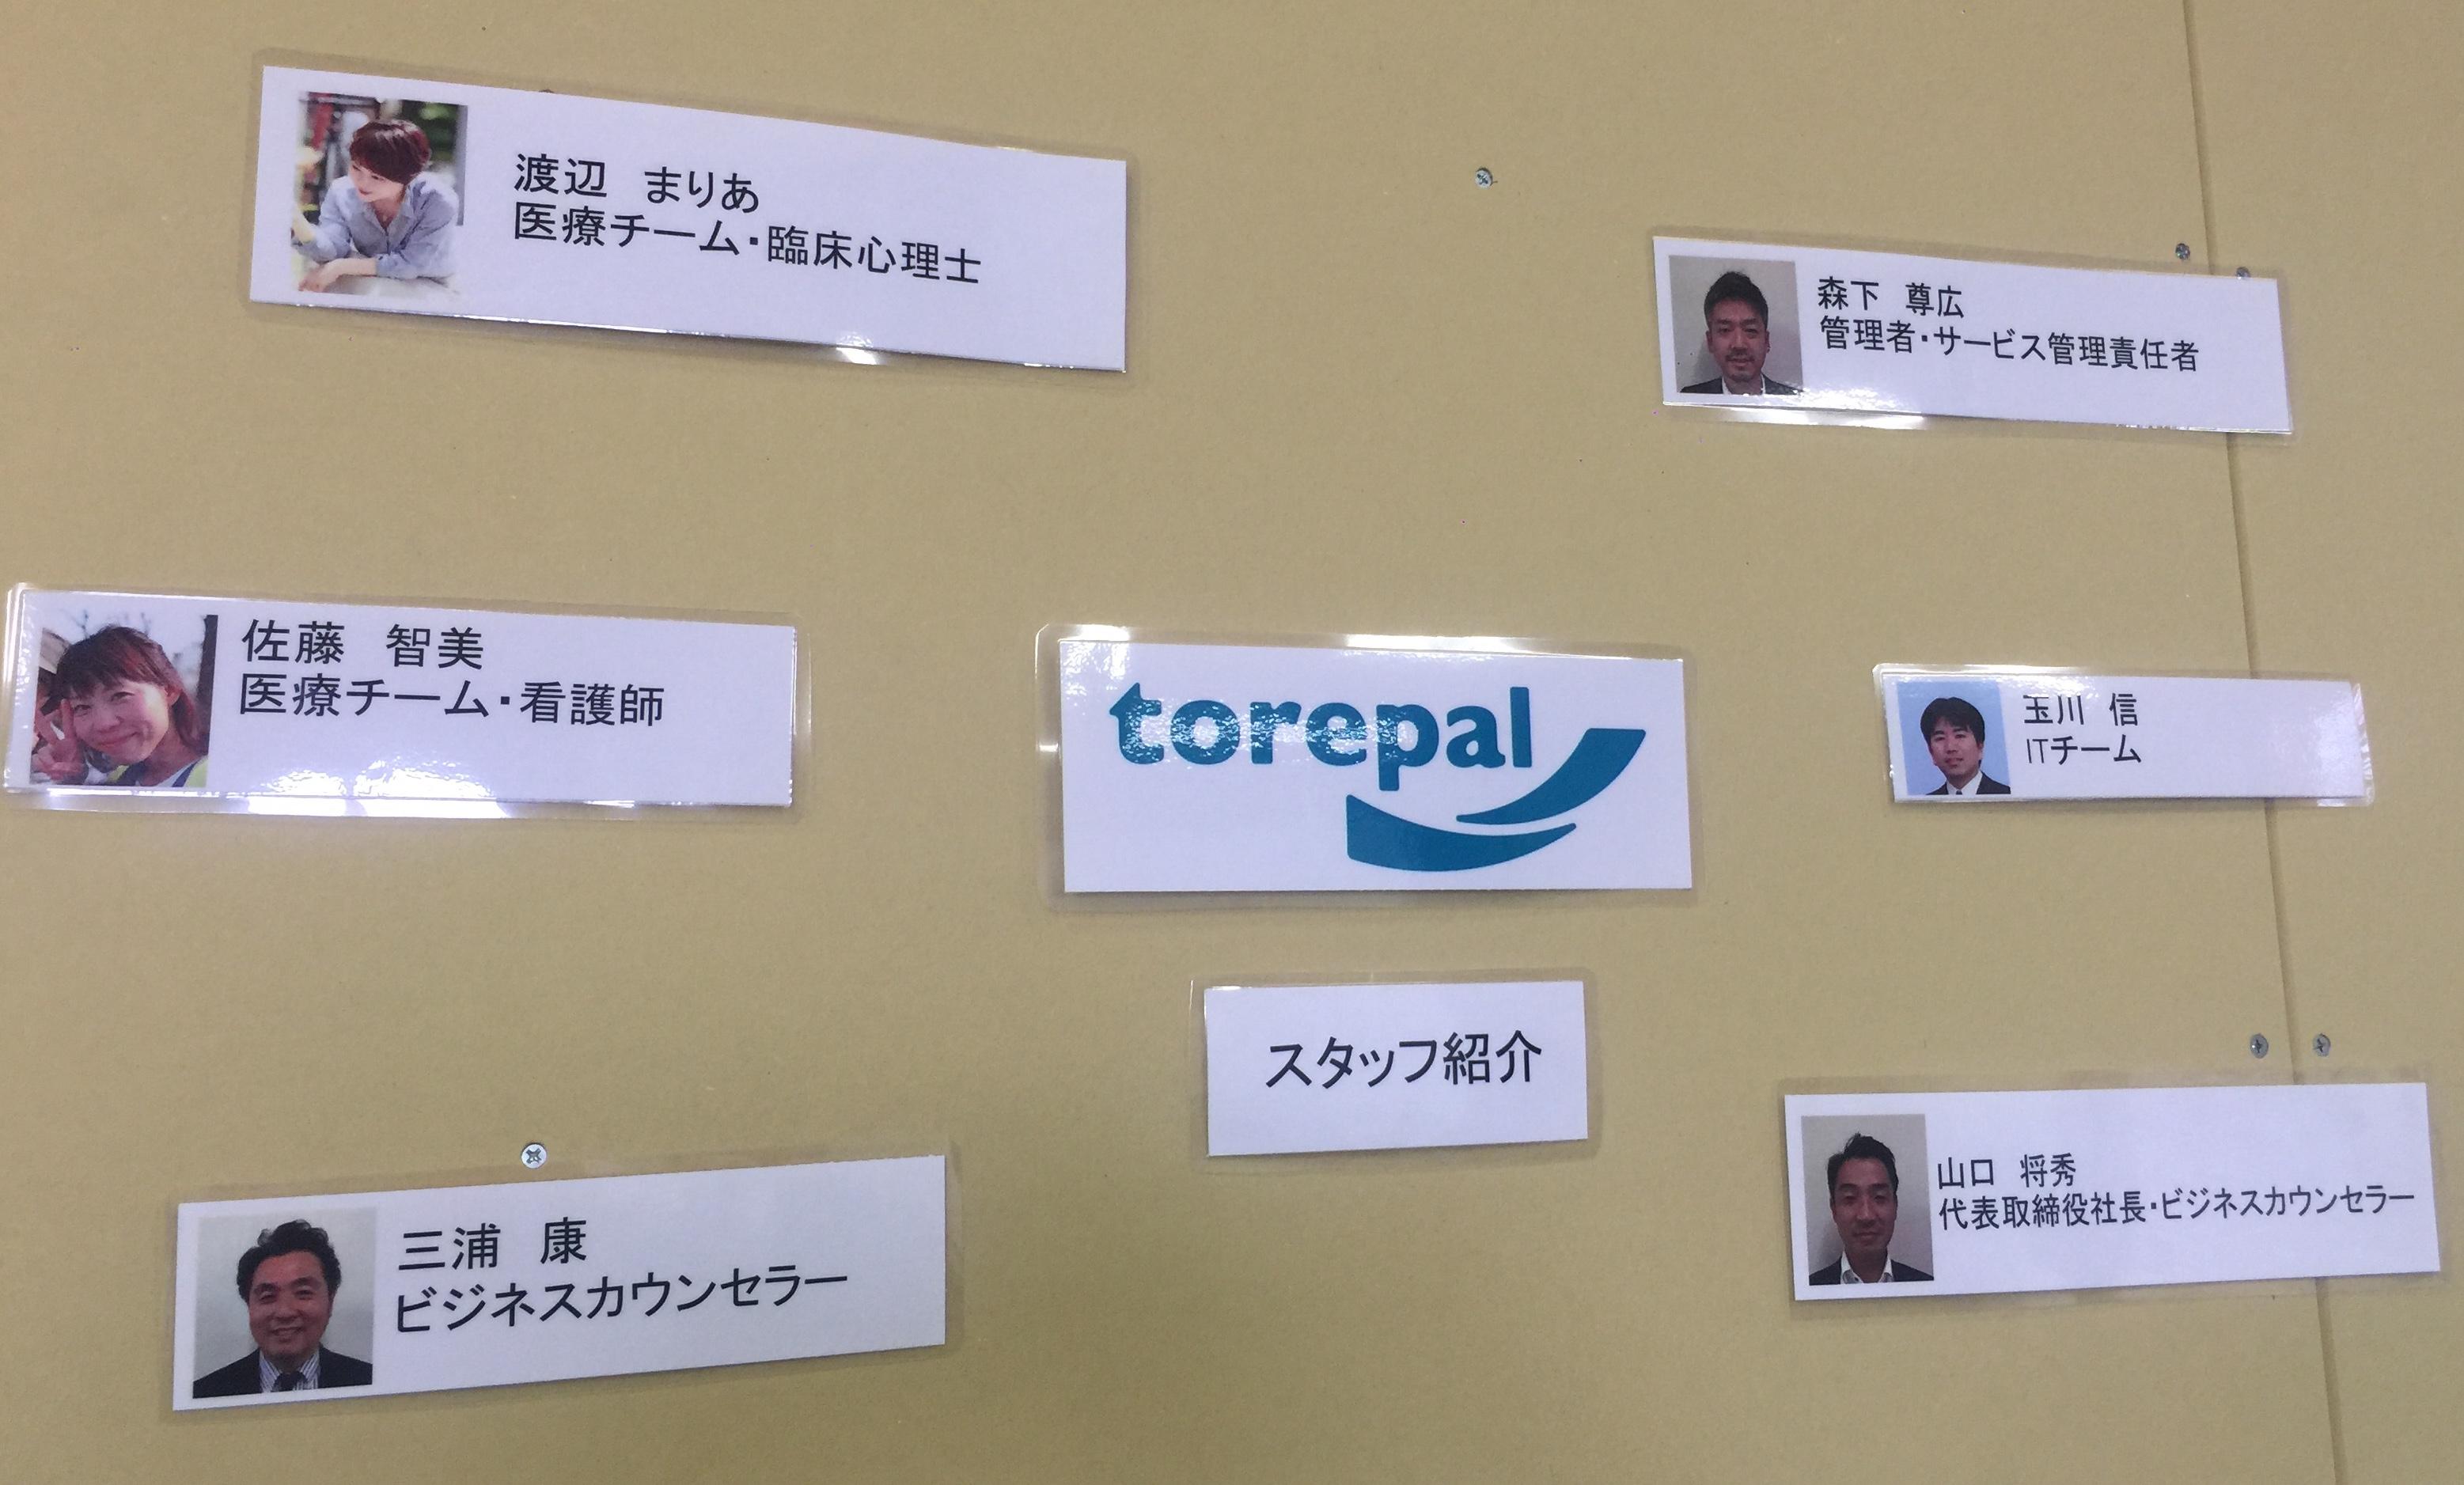 trepal(トレパル) 就労移行支援事業所のスタッフ